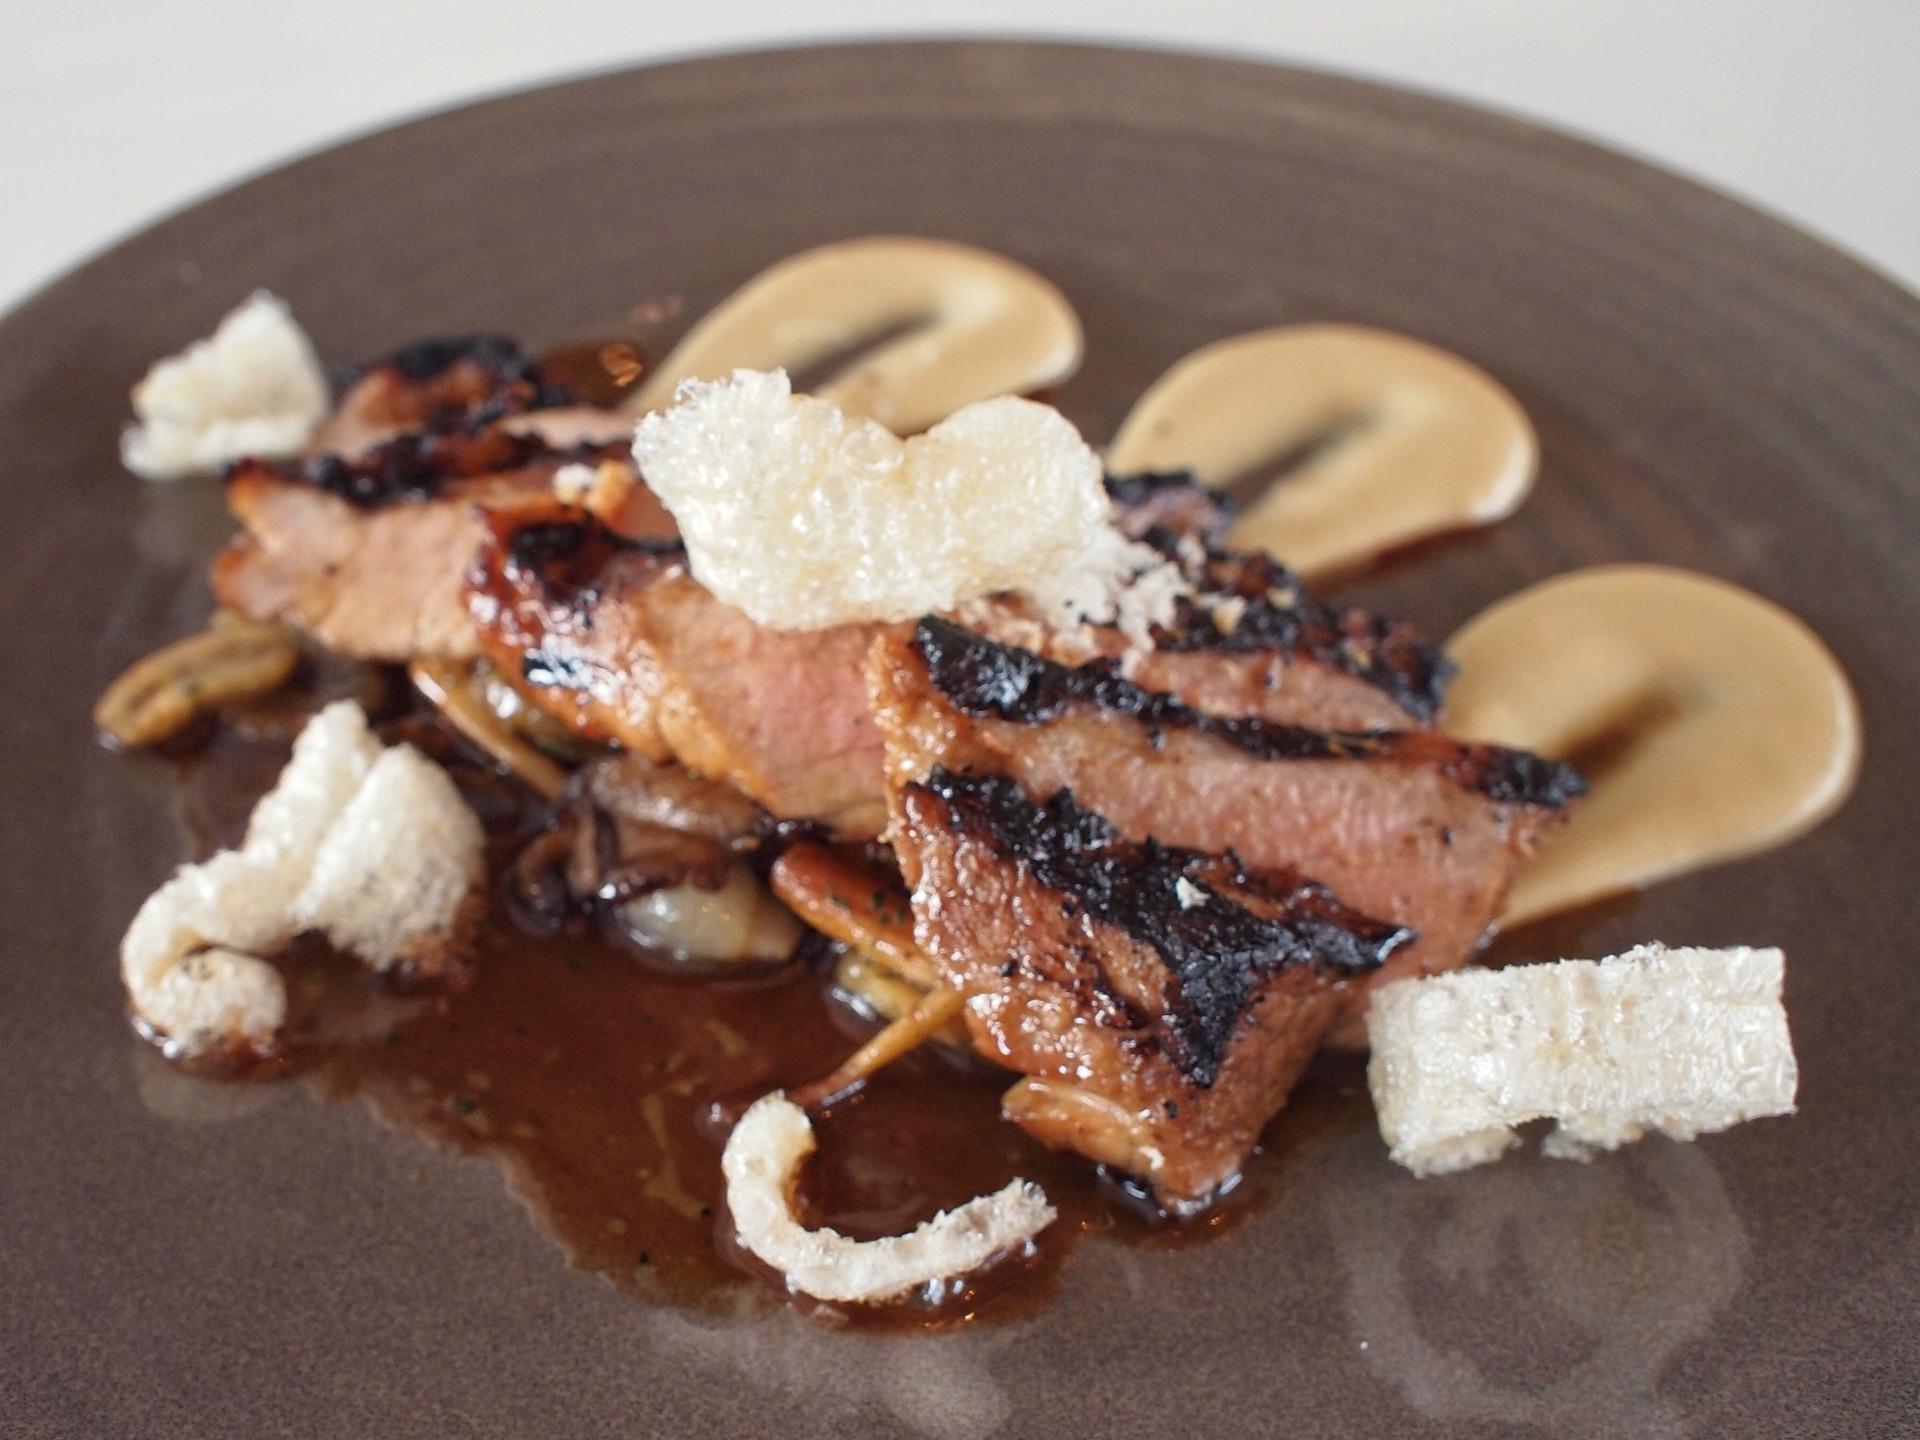 Grilled Iberico Pork Secreto